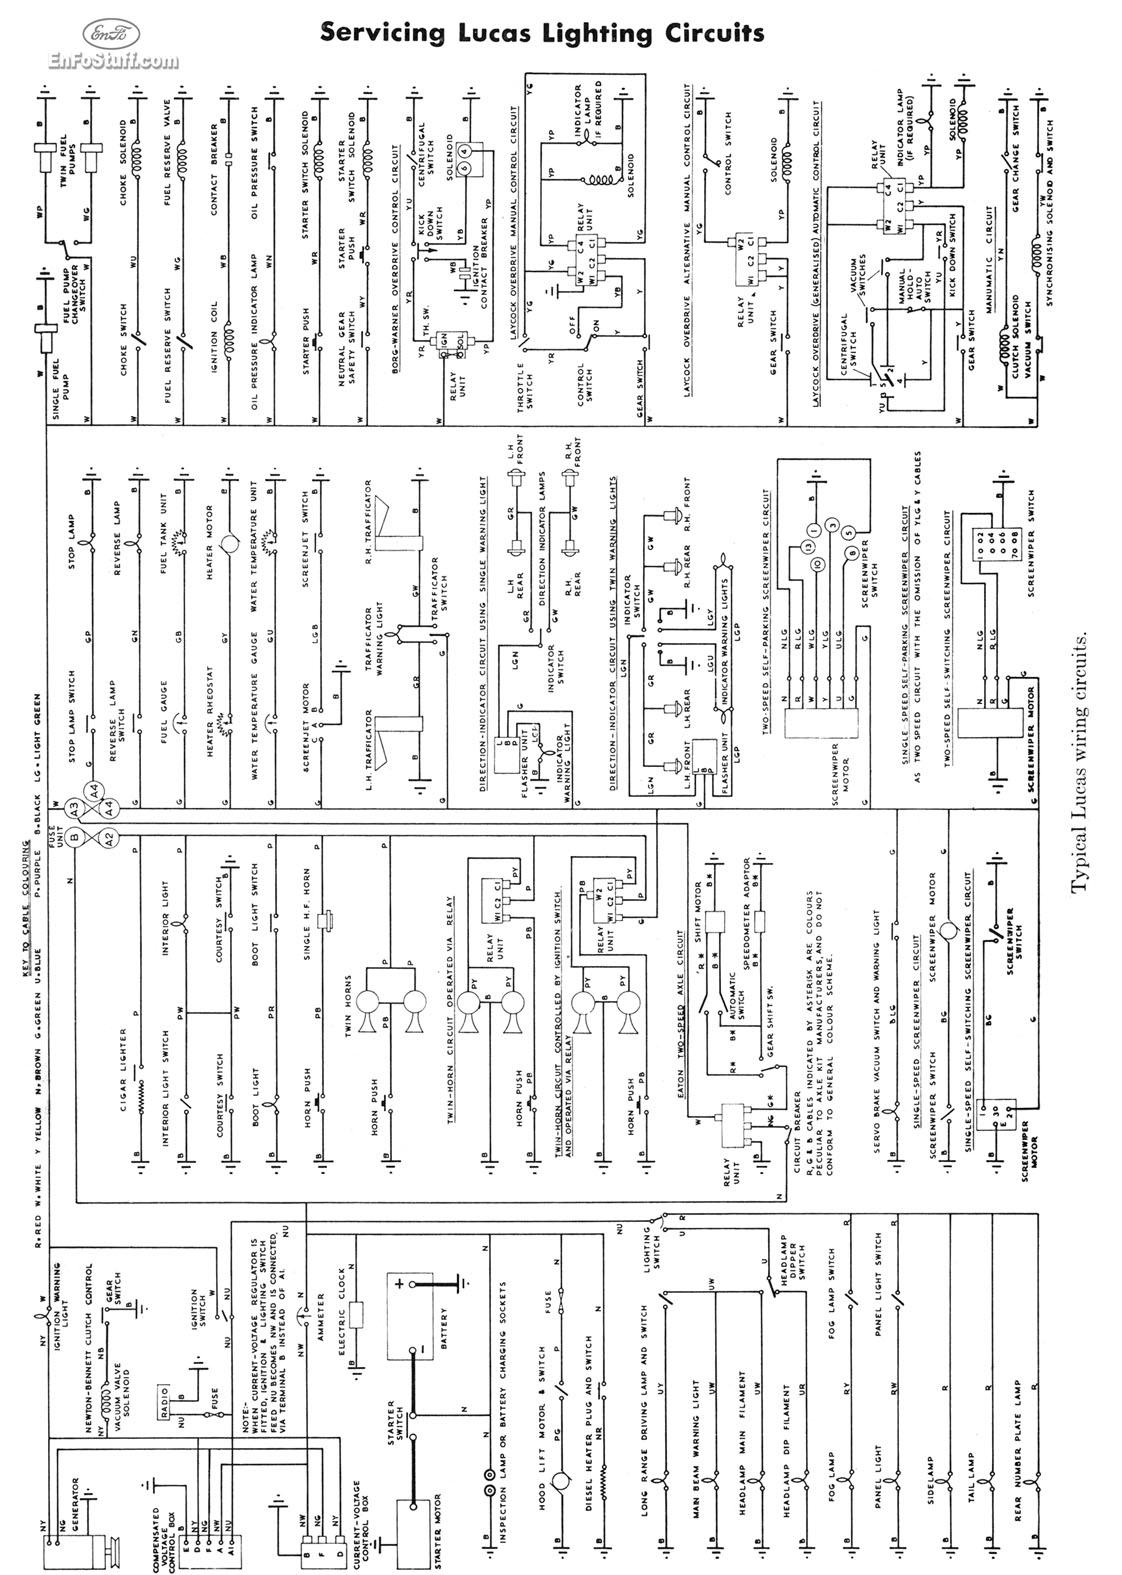 1985 land rover defender wiring diagram 1985 chevrolet